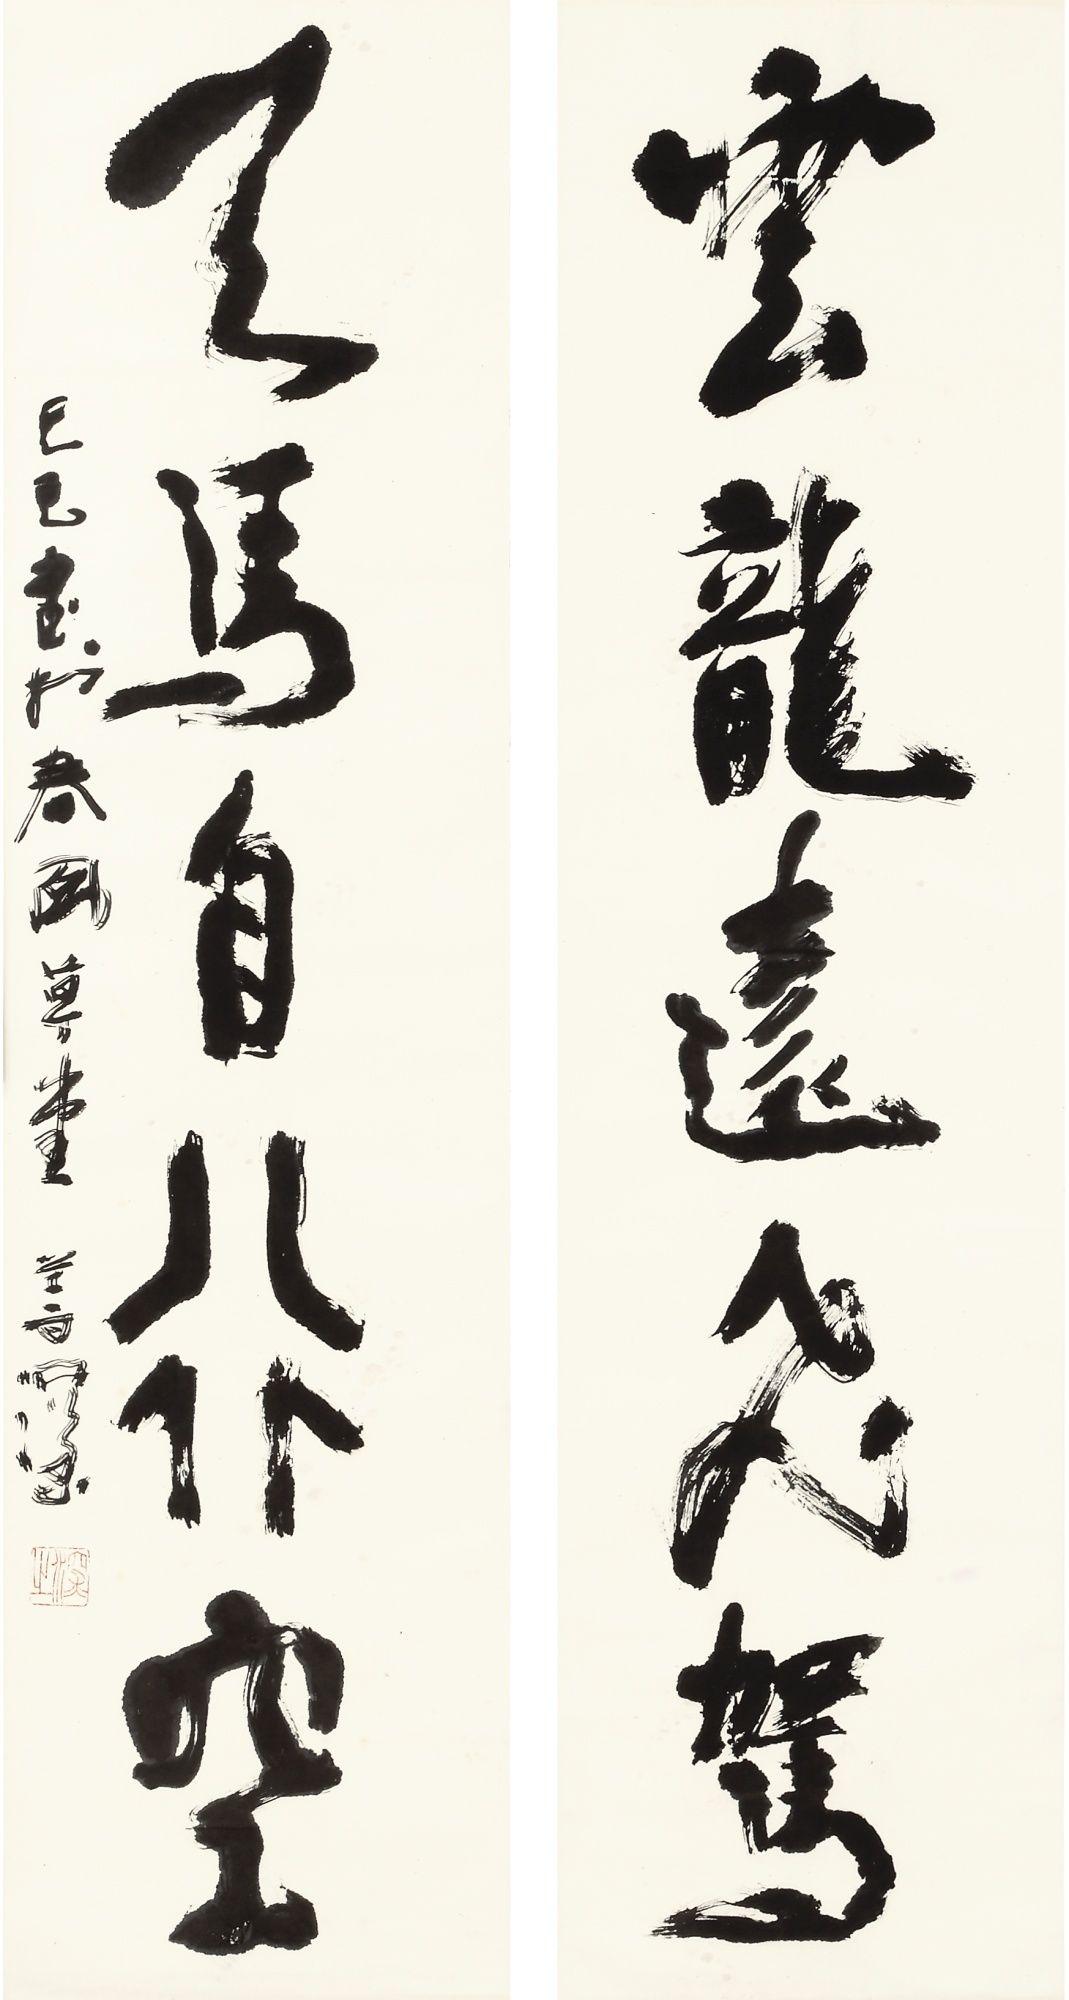 Yang Shanshen (1913-2004) CALLIGRAPHY COUPLET IN XINGSHU signed SHANSHEN, dated ji si, 1989, with one seal of the artist ink on paper, pair of hanging scrolls each 132.5 BY 33.5 CM. 52 1/8 BY 13 1/8 IN. 楊善深 (1913-2004) 行書五言聯 水墨紙本 立軸 一九八九年作 款識: 雲龍遠飛駕,天馬自行空。己巳書於春風草堂。善深。 鈐印:「深之」。 each 132.5 BY 33.5 CM. 52 1/8 BY 13 1/8 IN. (2)